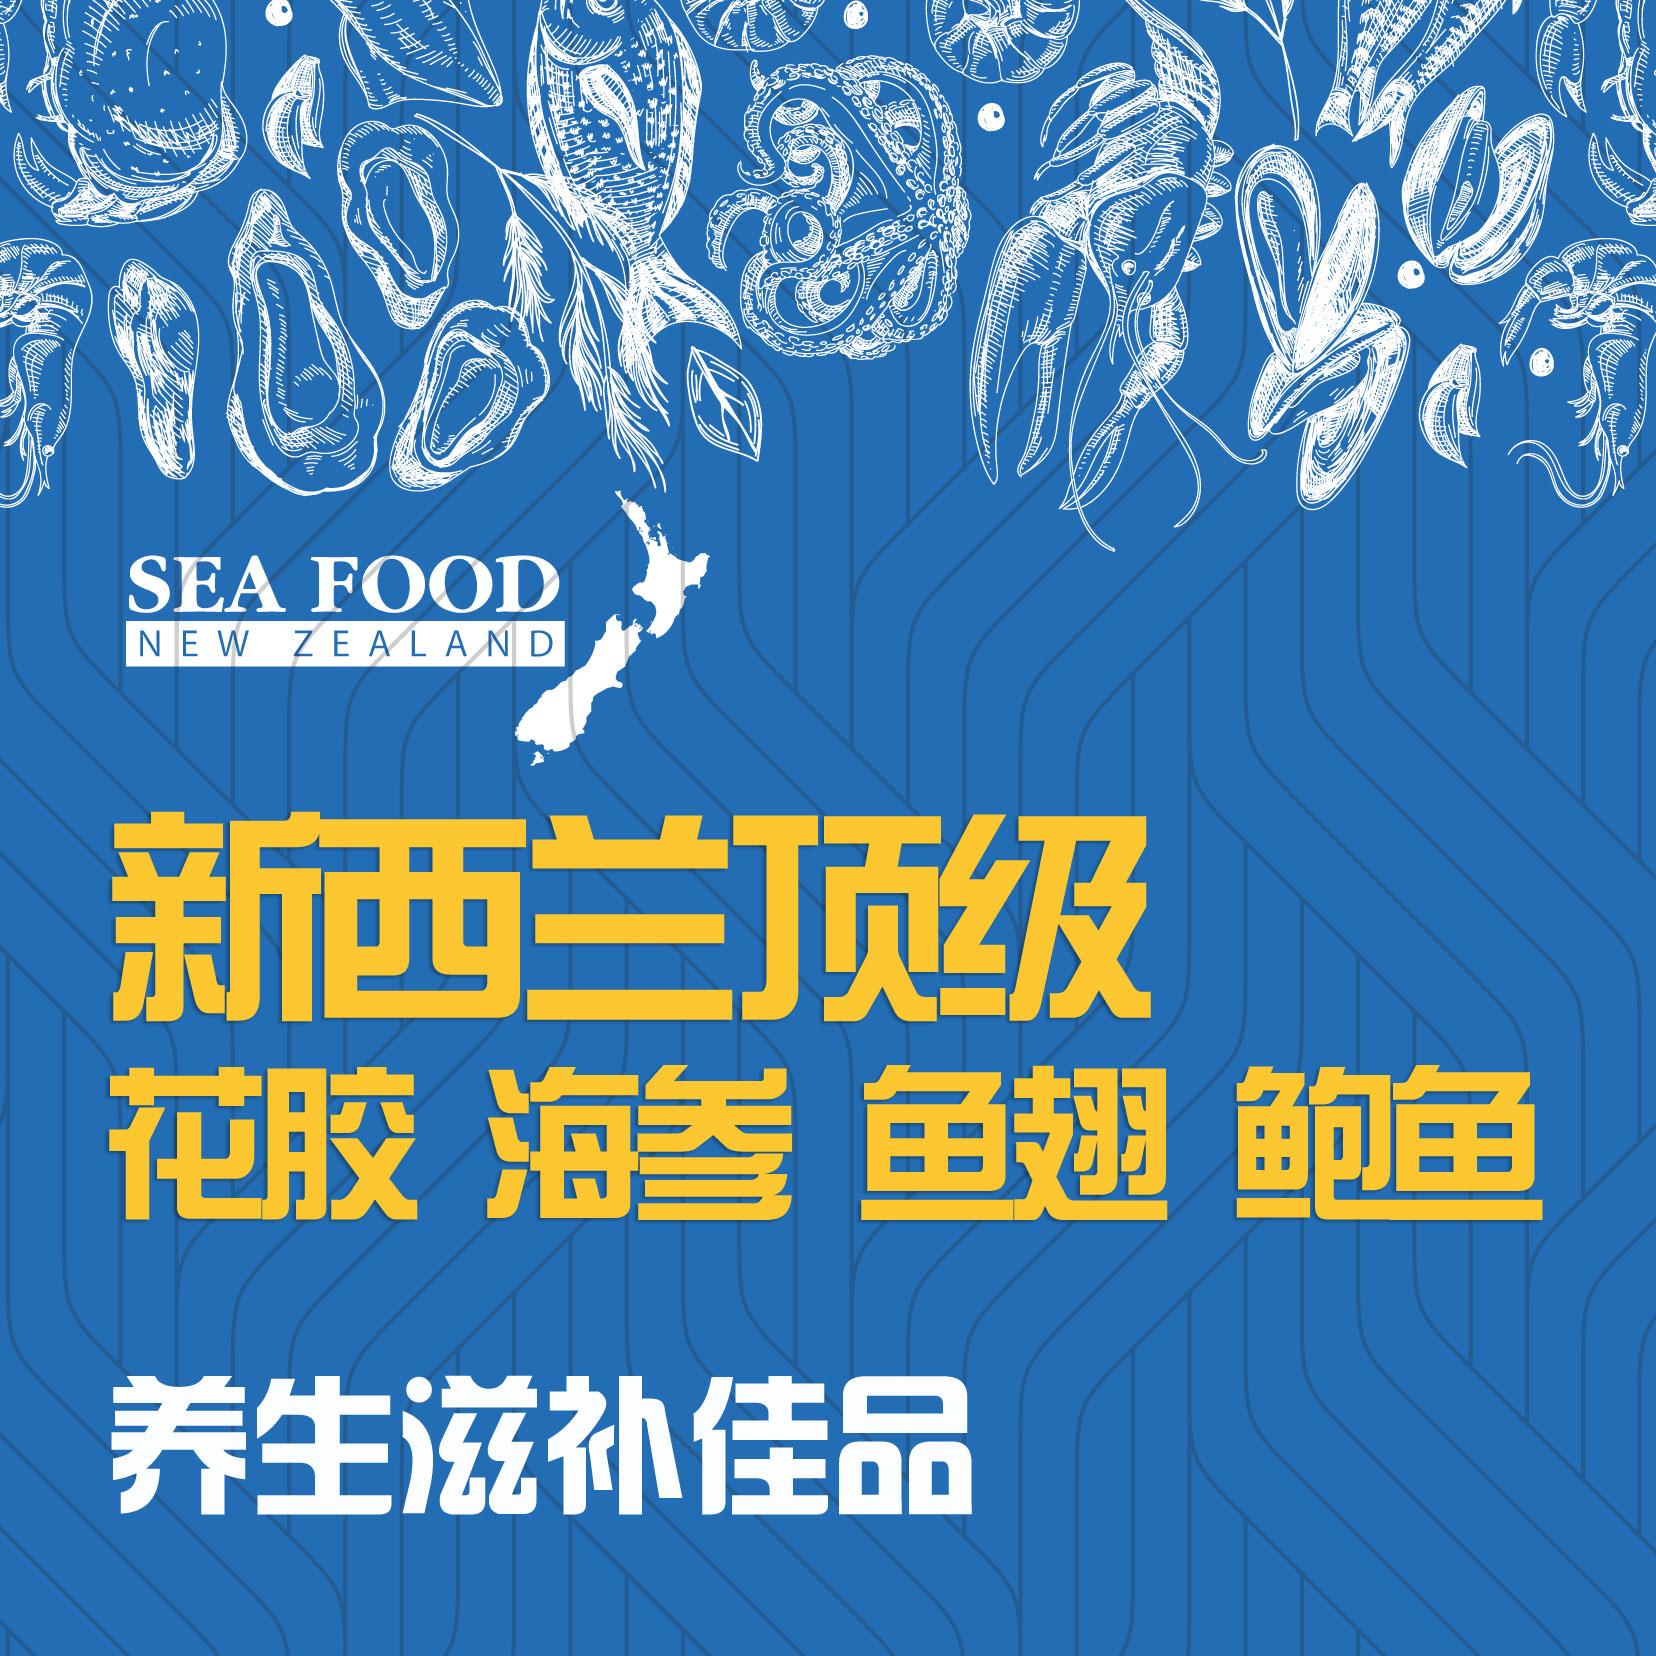 Seafood Banner